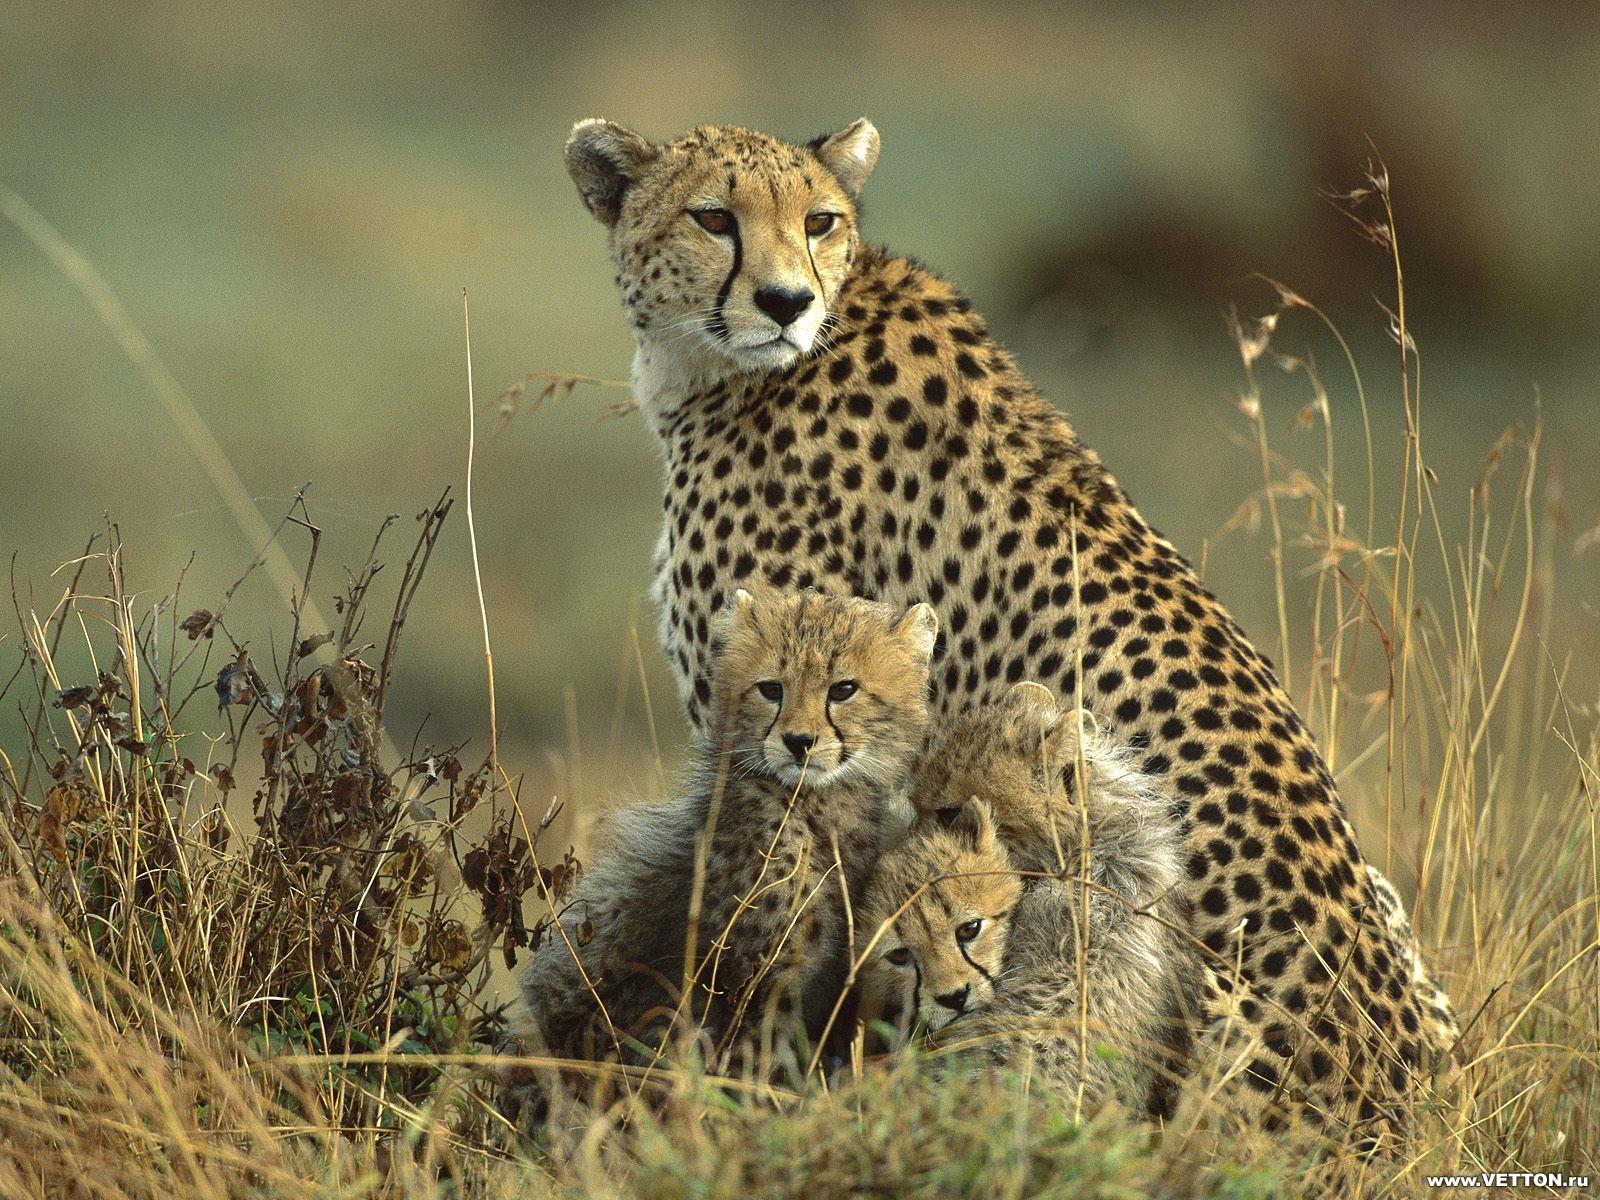 Beautiful Wallpapers: baby cheetah wallpaper | 1600 x 1200 jpeg 624kB